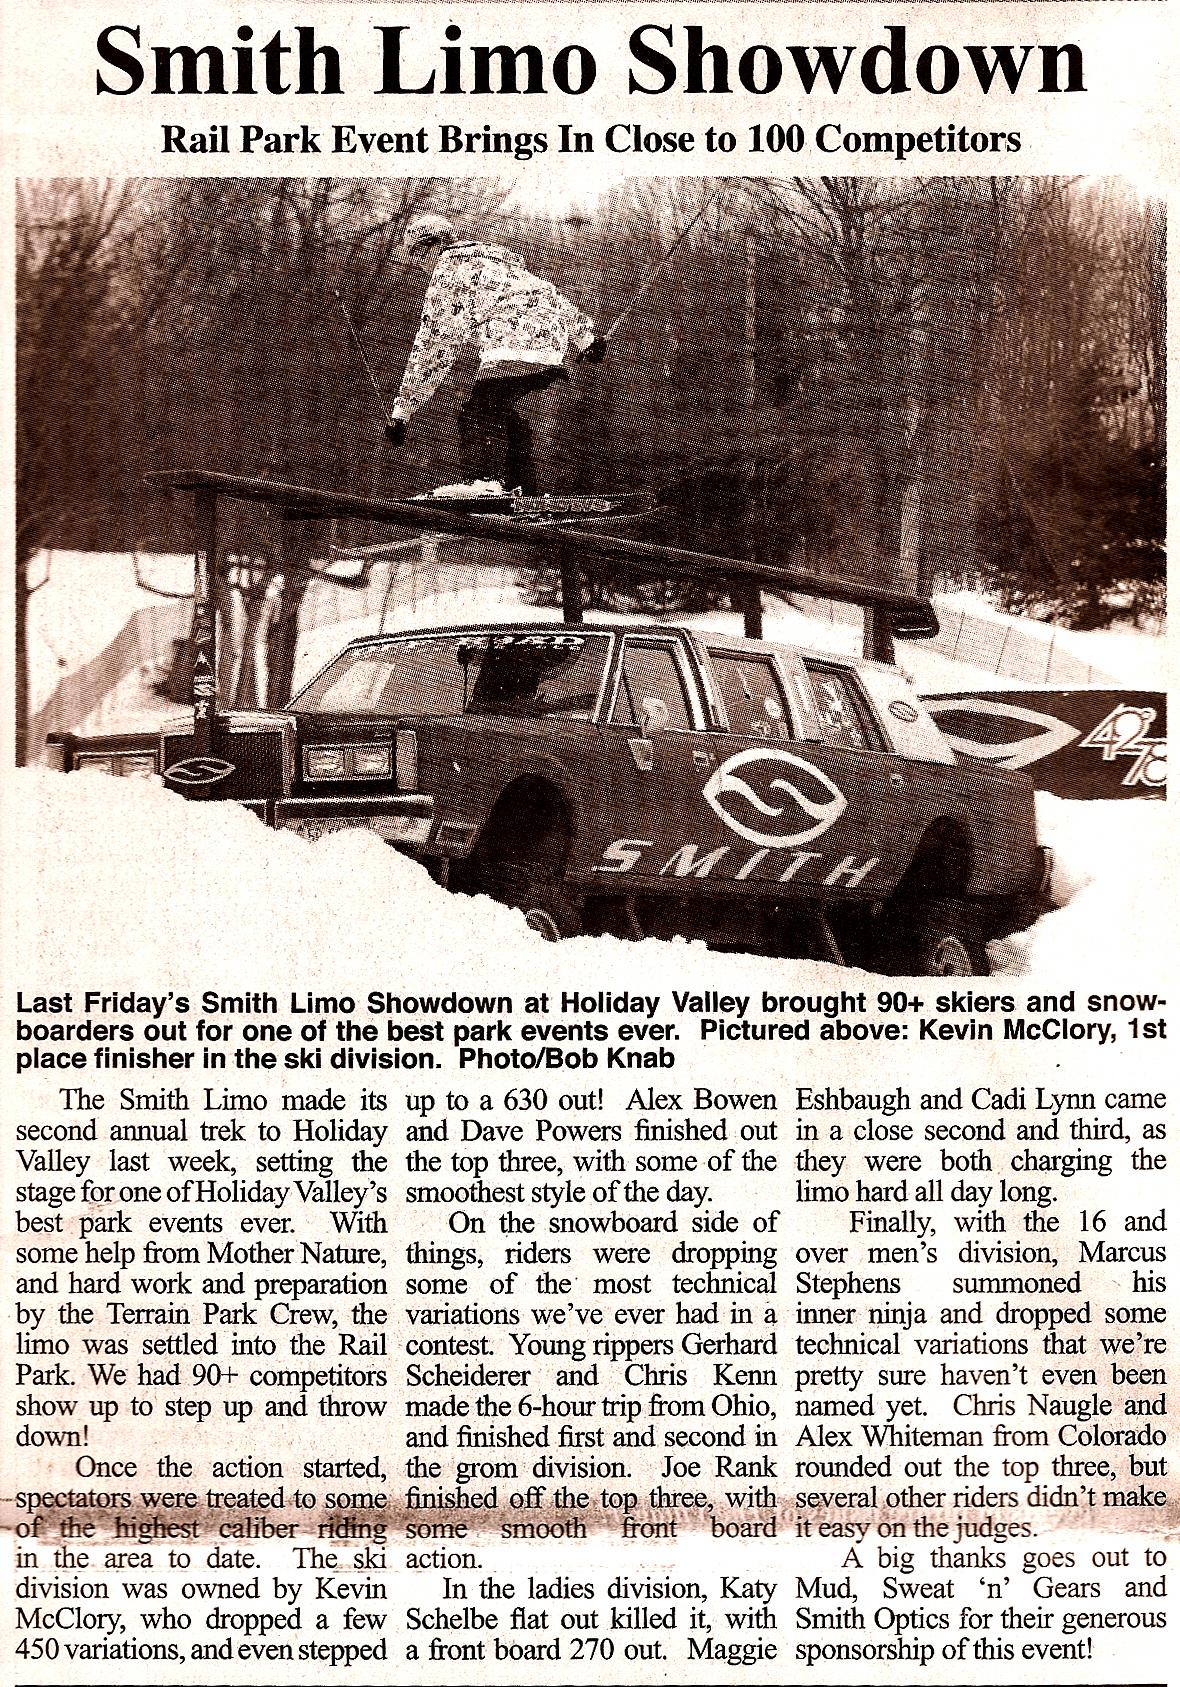 Smith limo showdown